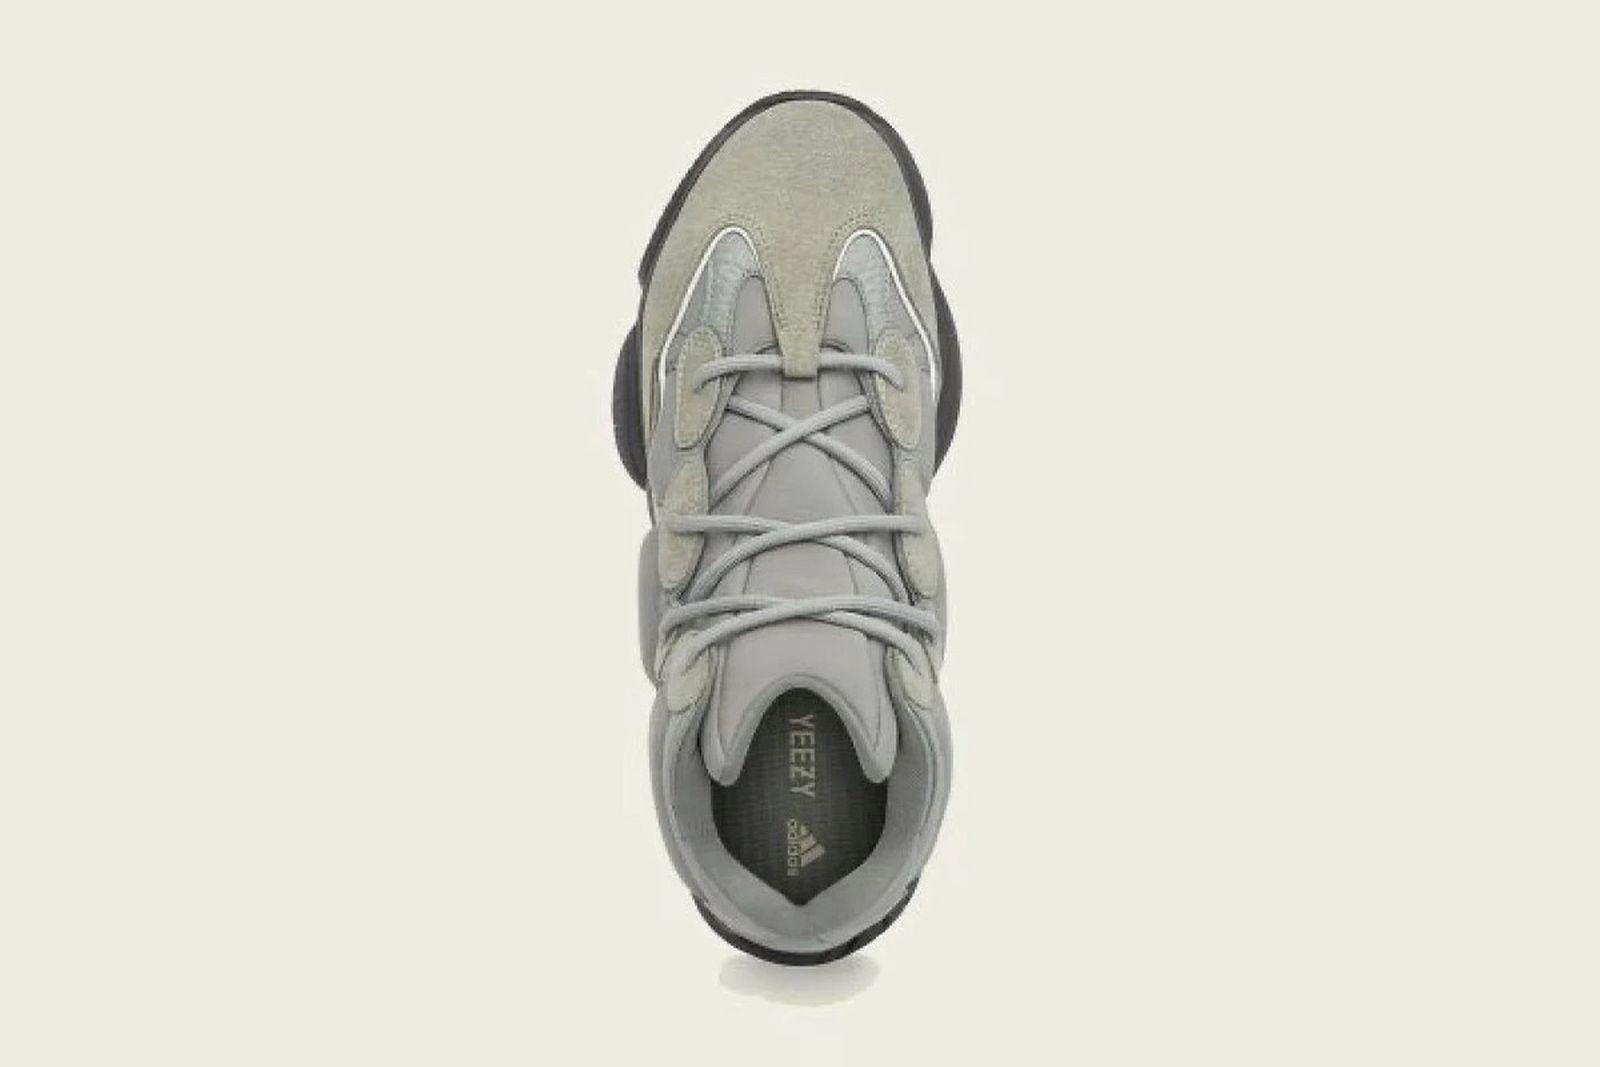 adidas-yeezy-500-high-mist-slate-release-info-03